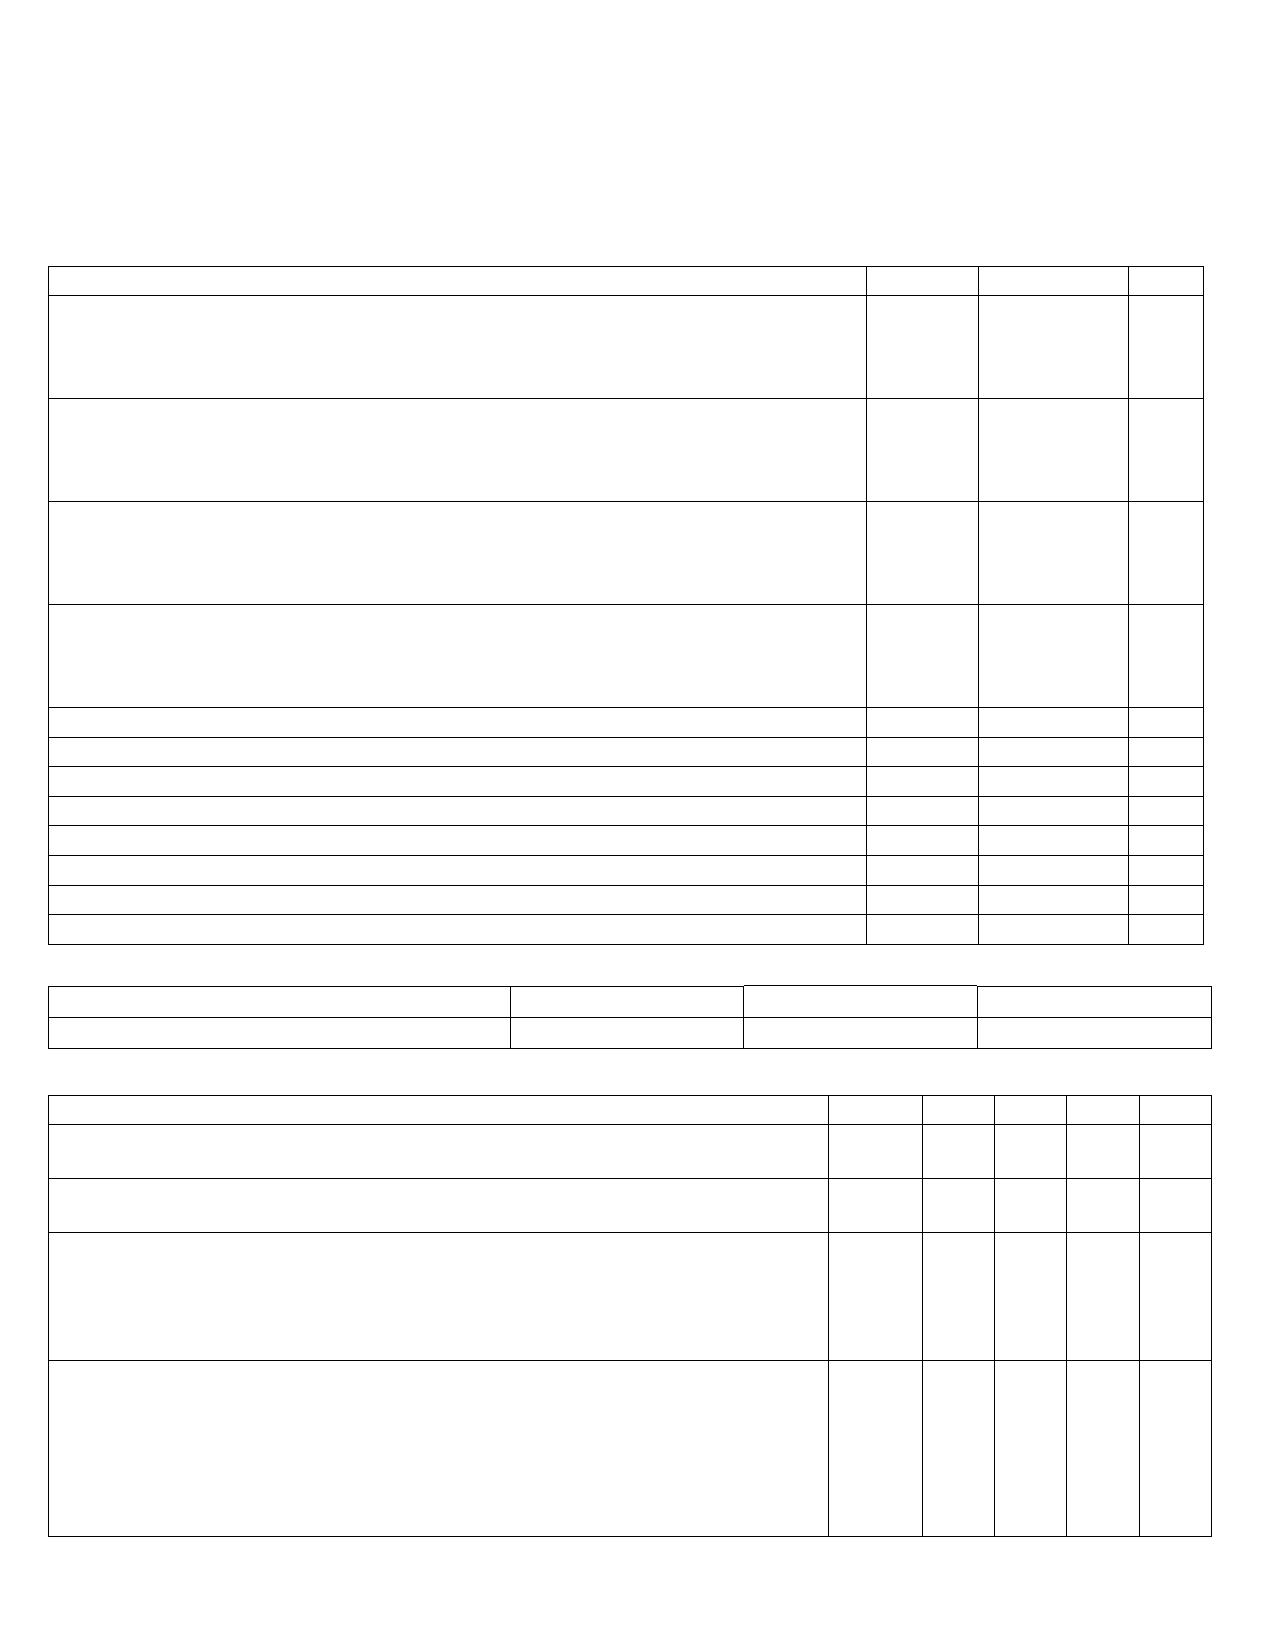 BT162 Datasheet, BT162 PDF,ピン配置, 機能